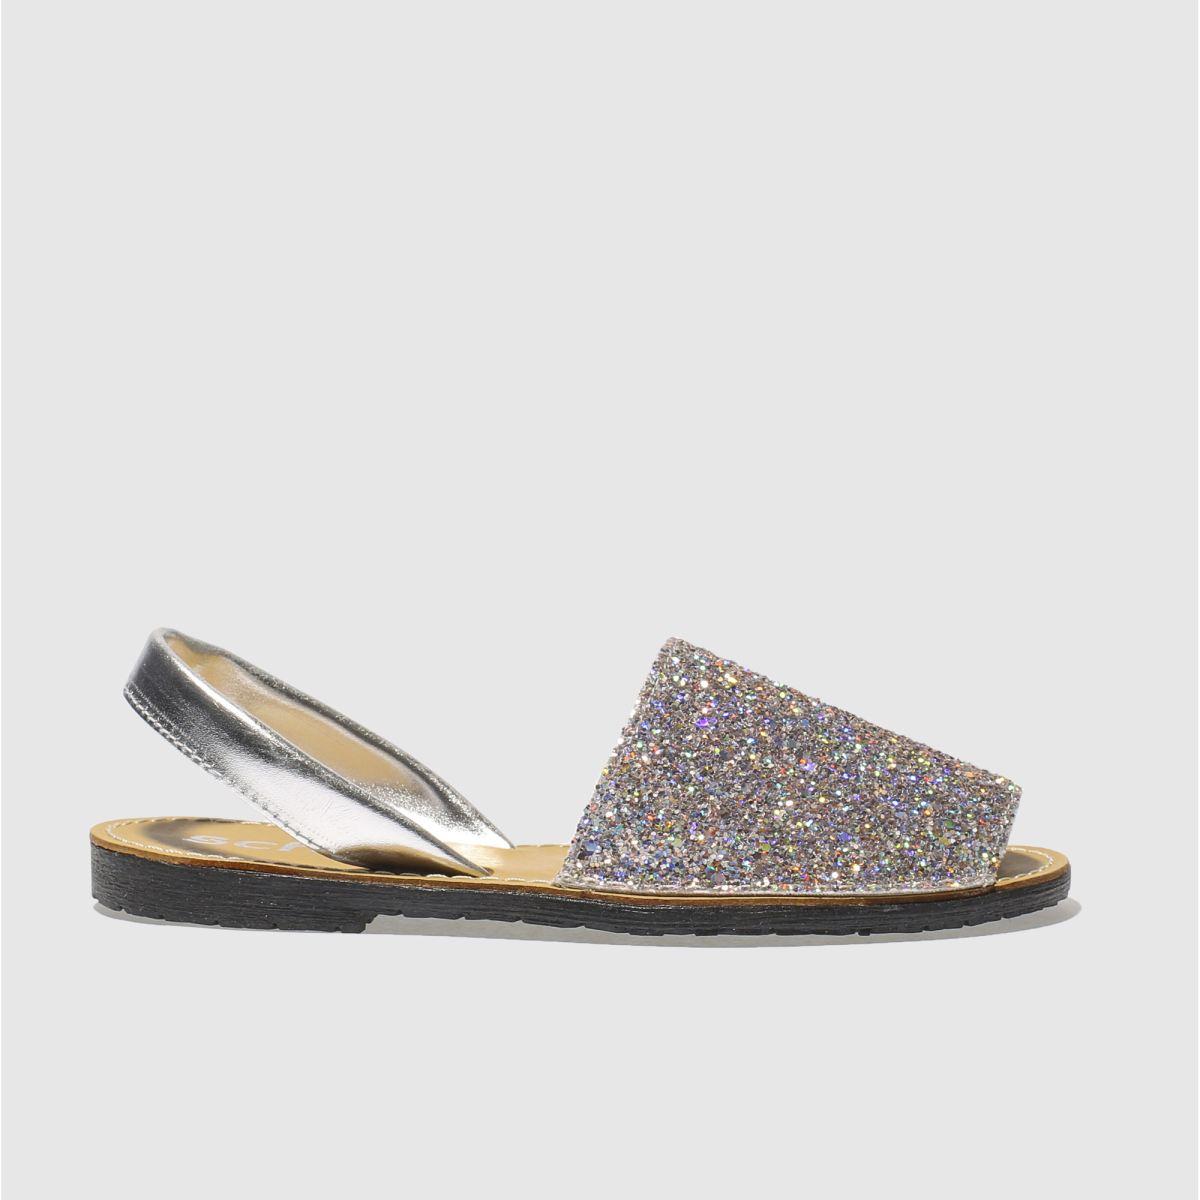 schuh silver barcelona glitter sandals